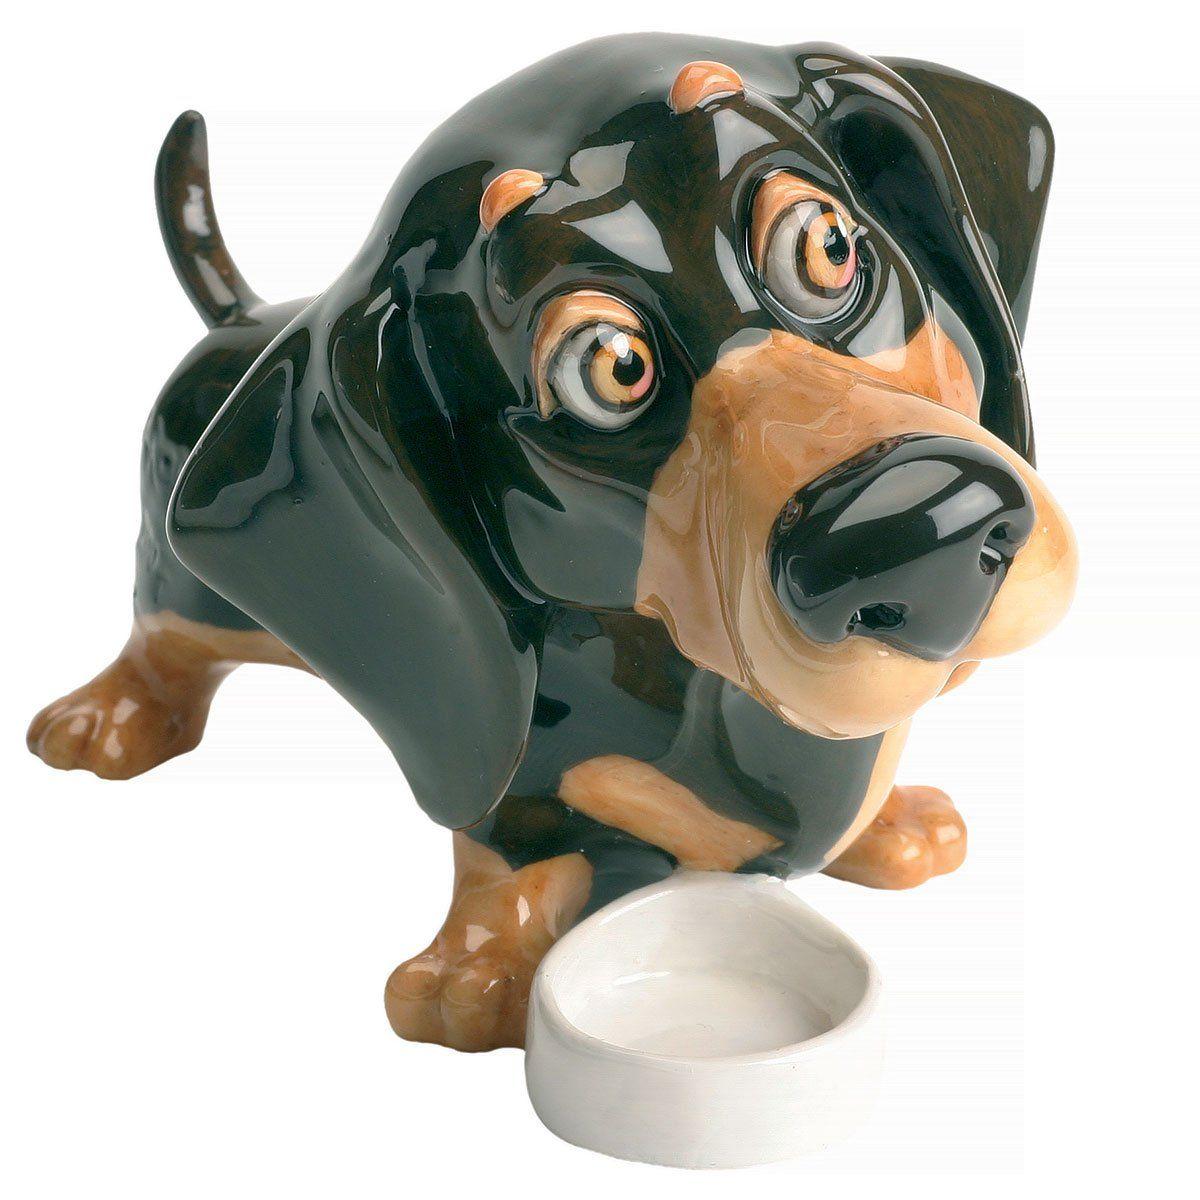 Little Paws Filo Dachshund Dog Figurine 6 75 Dog Figurines Dachshund Dog Dog Ornaments